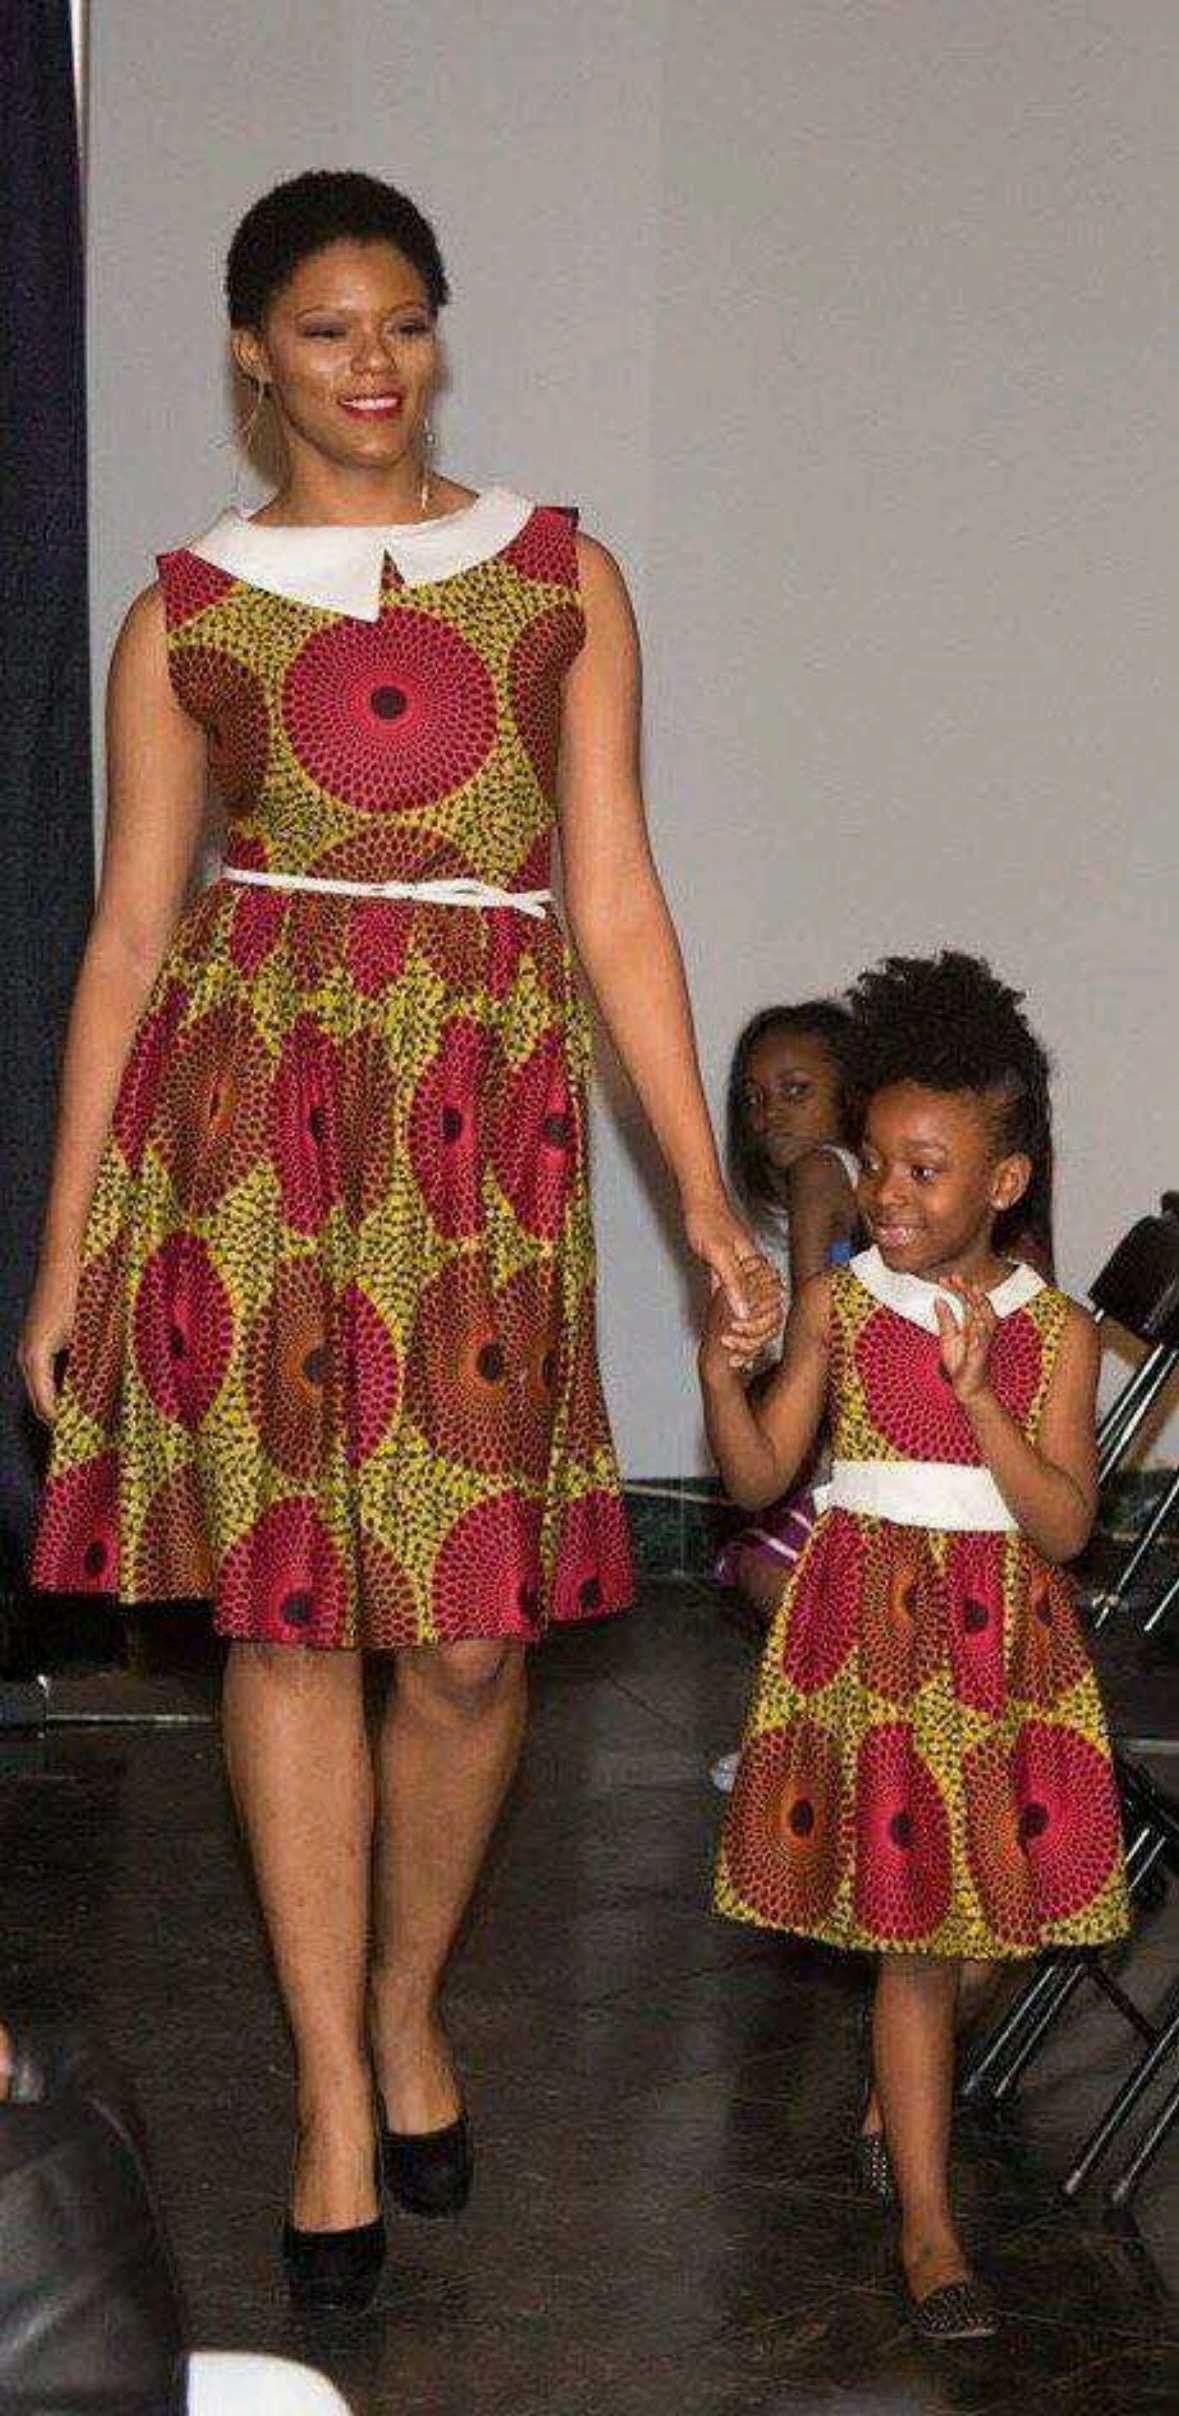 Lace short dress styles in nigeria  Pin by Larissa Kryukova on beautiful dresses  Pinterest